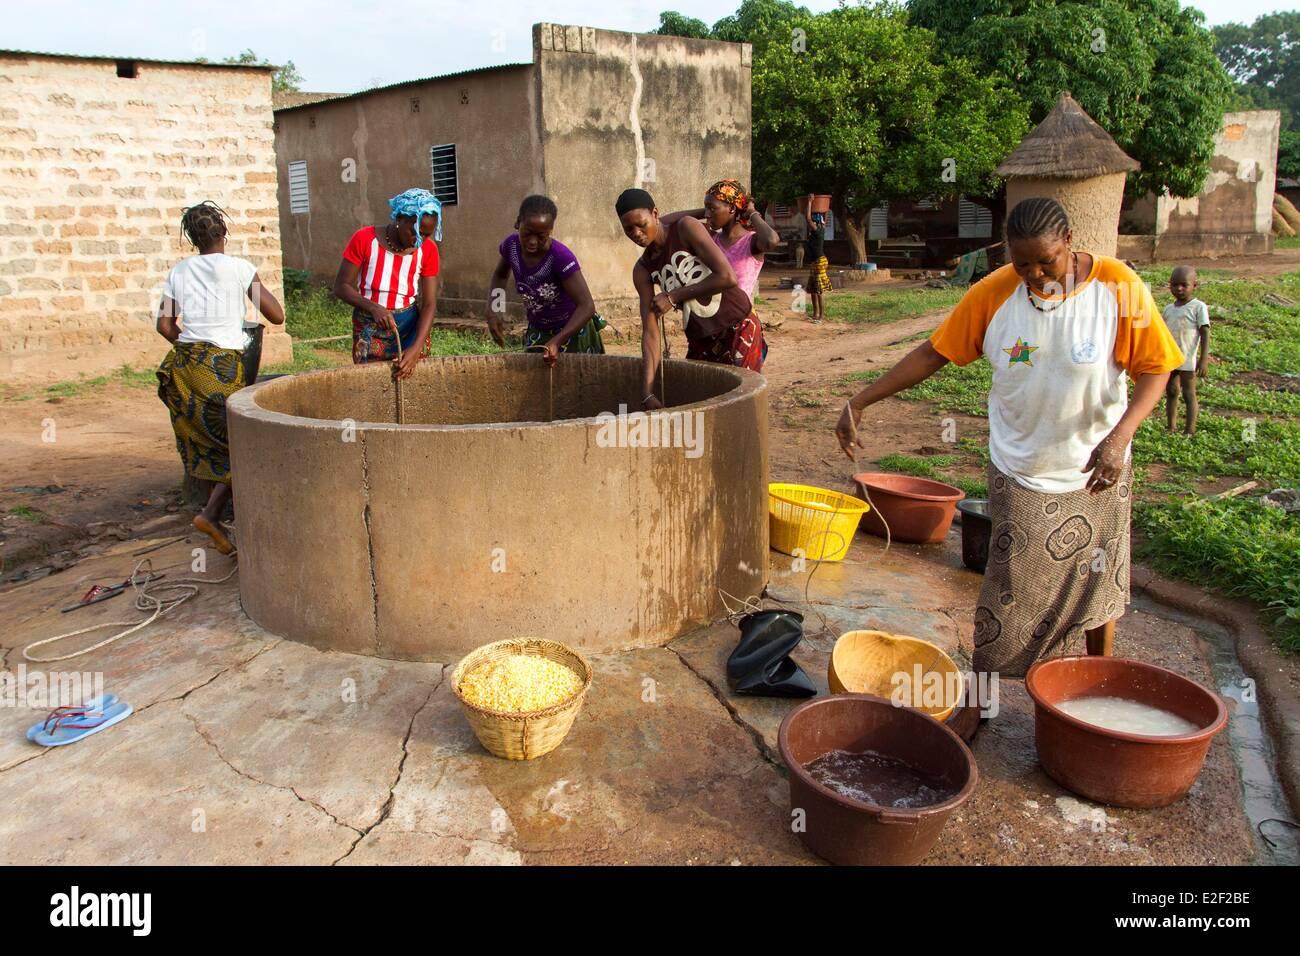 Burkina Faso, village in Senoufo area, at the well - Stock Image